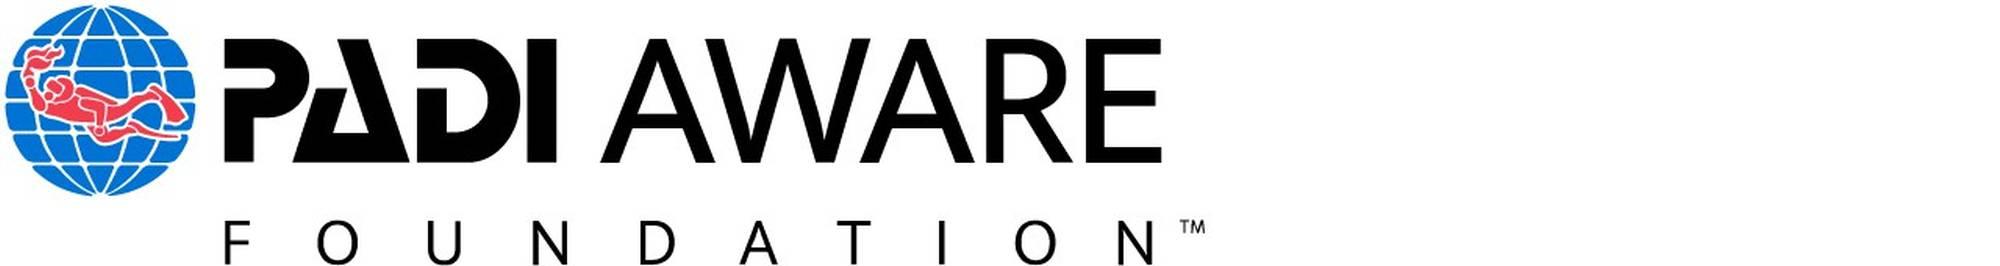 PADI AWARE logo